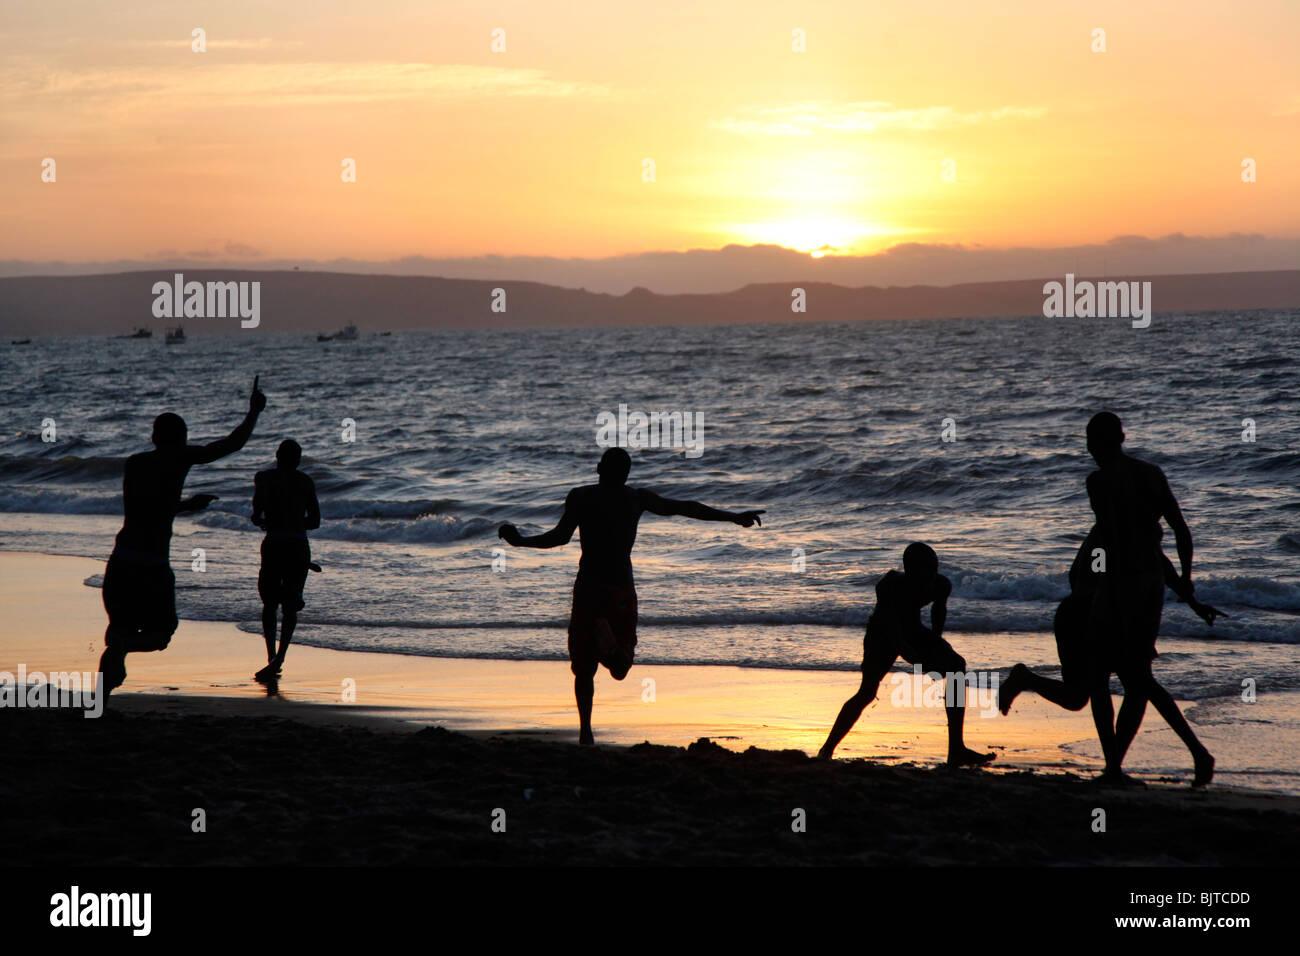 Friends playing football on the beach as the sun sets. Benguela city beach, Angola. Africa © Zute Lightfoot - Stock Image